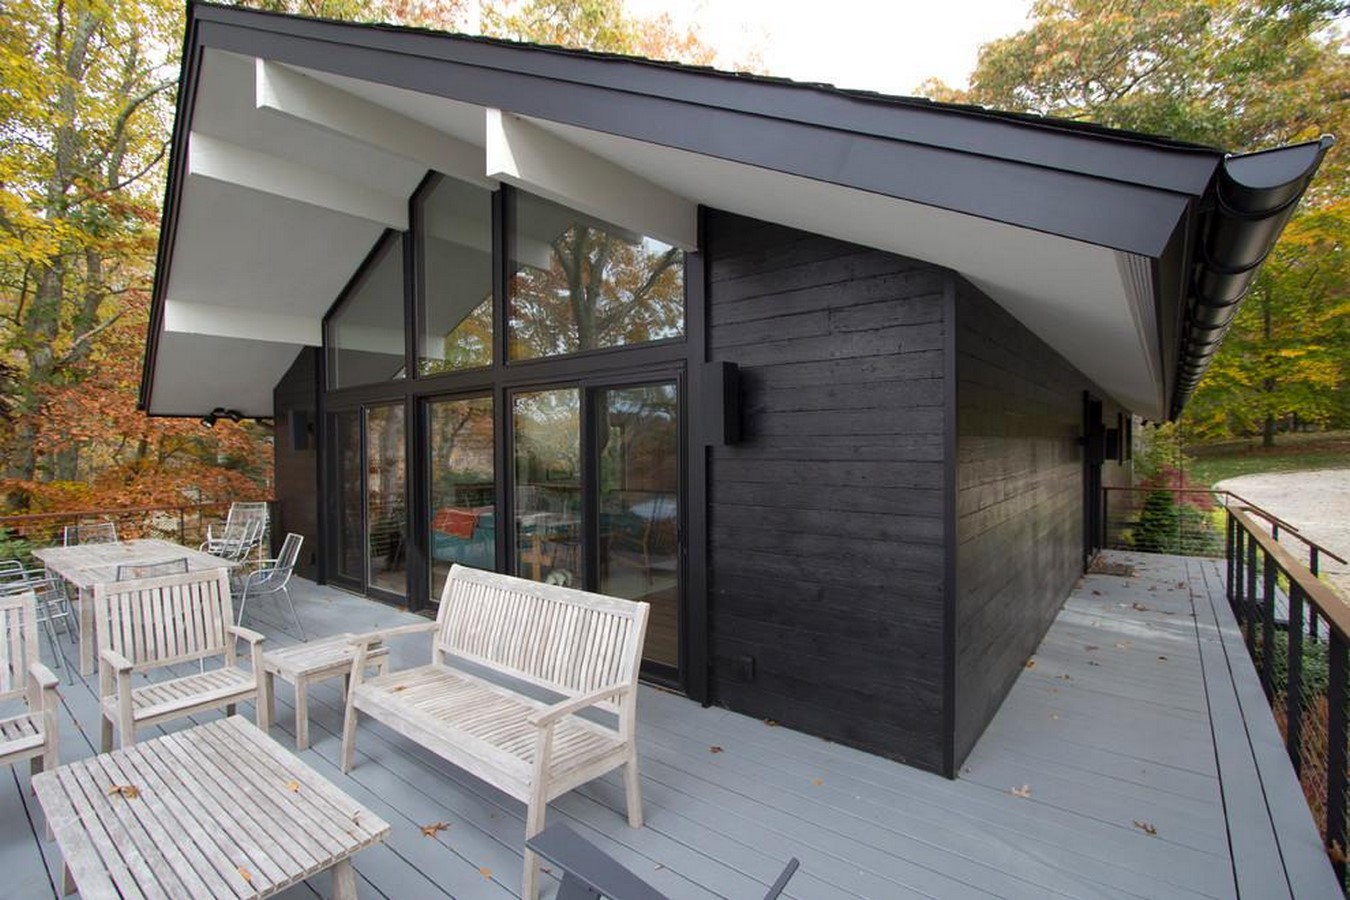 Modern Home Using Charred Wood by Resawn, New York - Sheet2